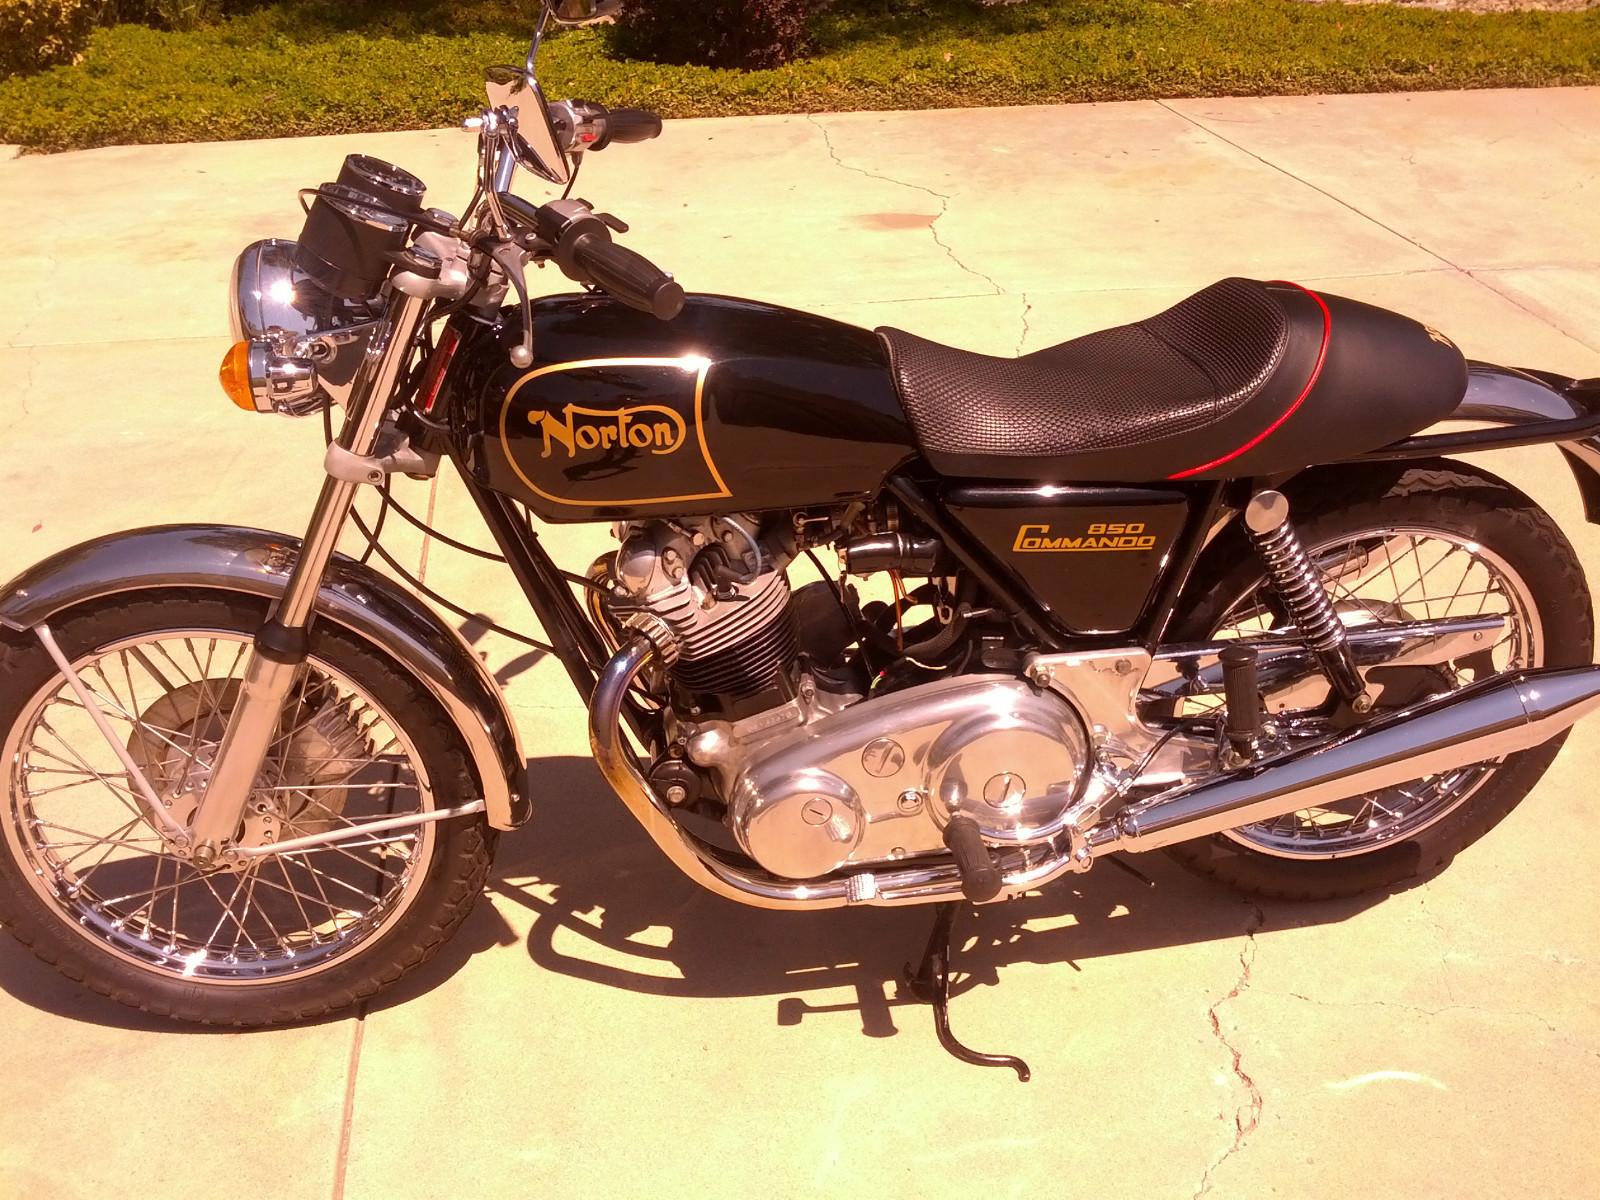 Norton Commando 850 - 1974